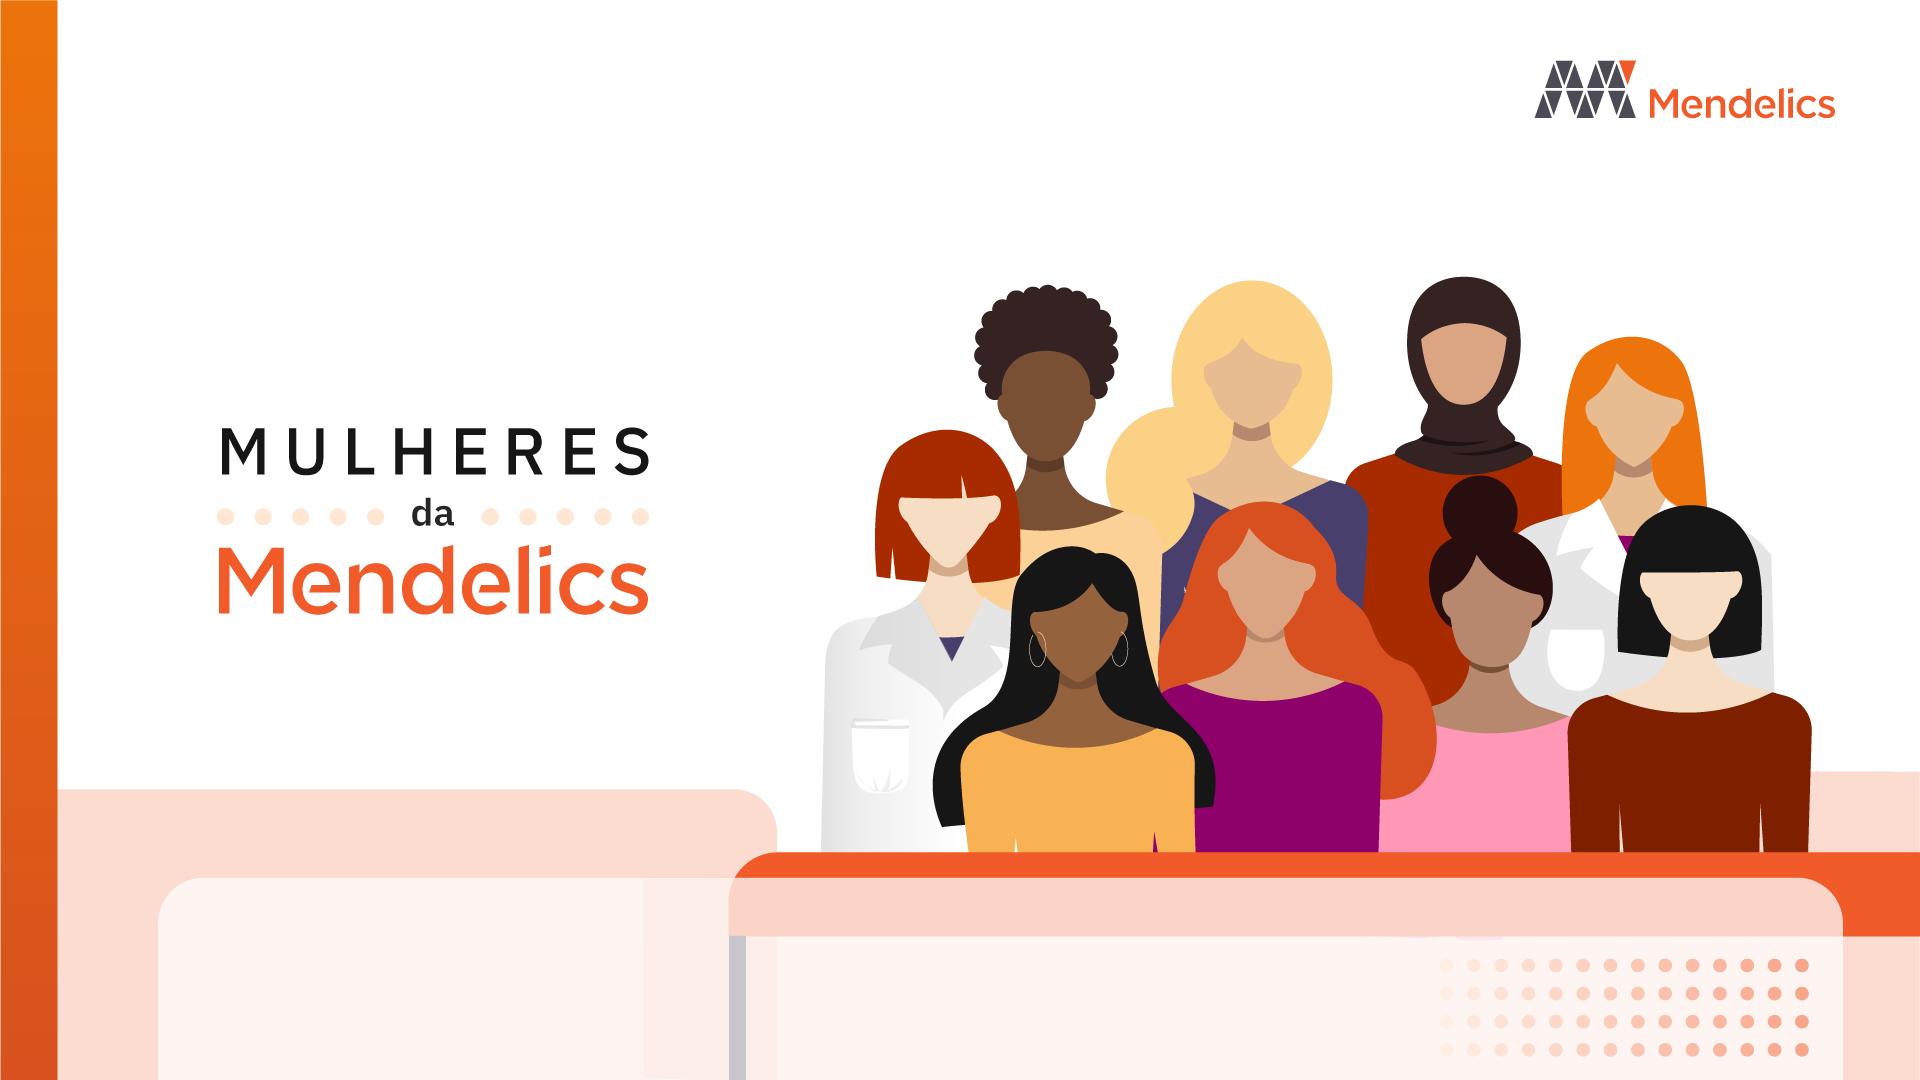 mendelics mulheres empresa genetica colaboradores representatividade feminina liderança lideres